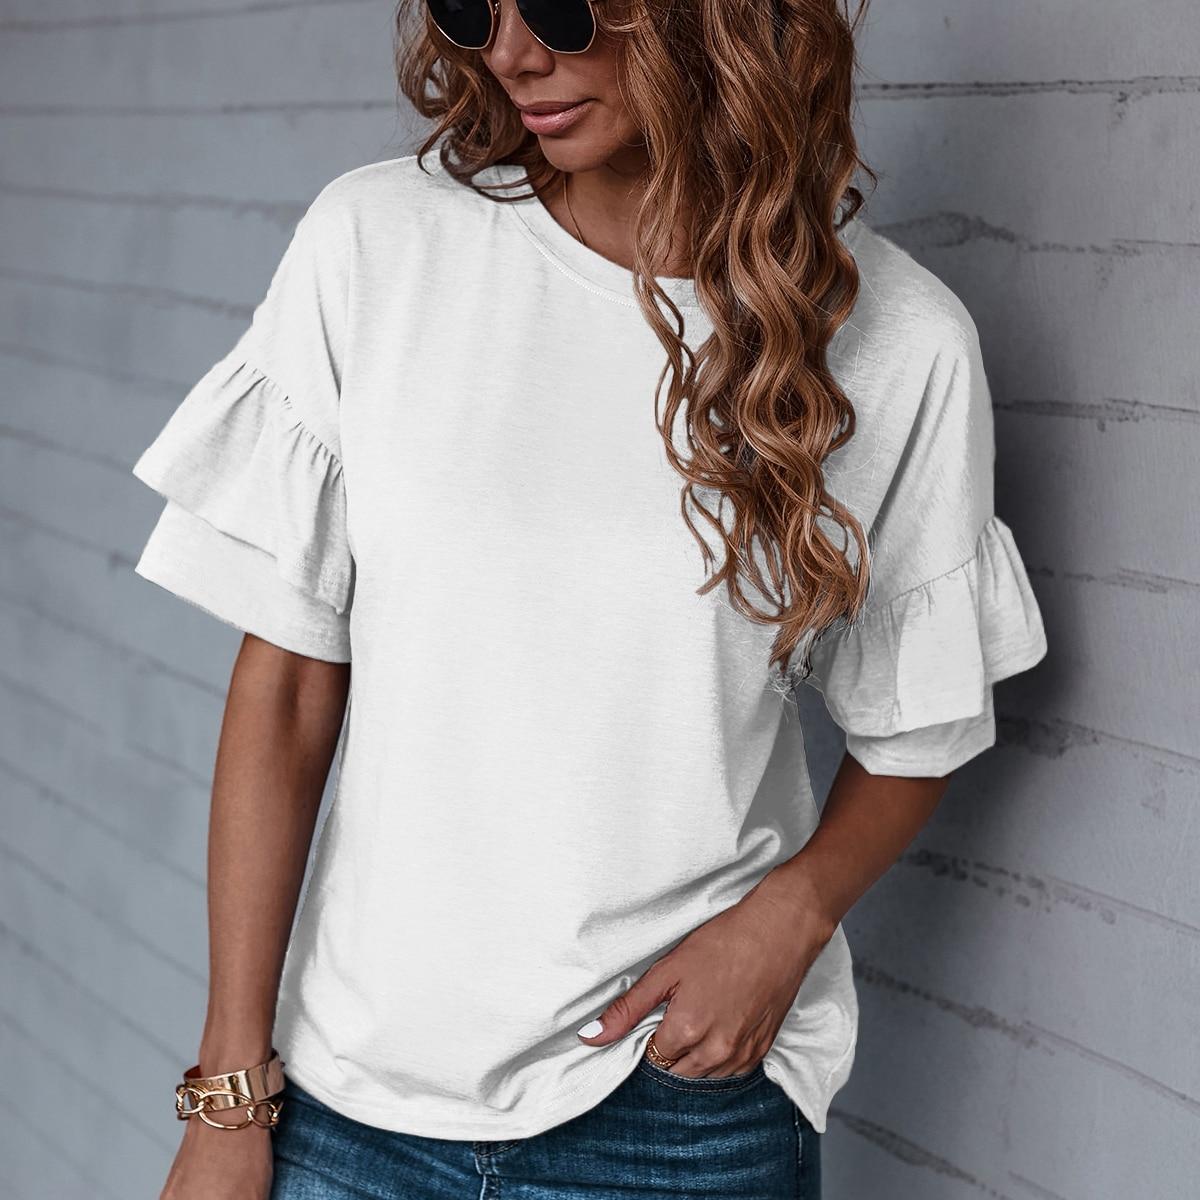 Однотонная футболка SheIn swtee23210609438